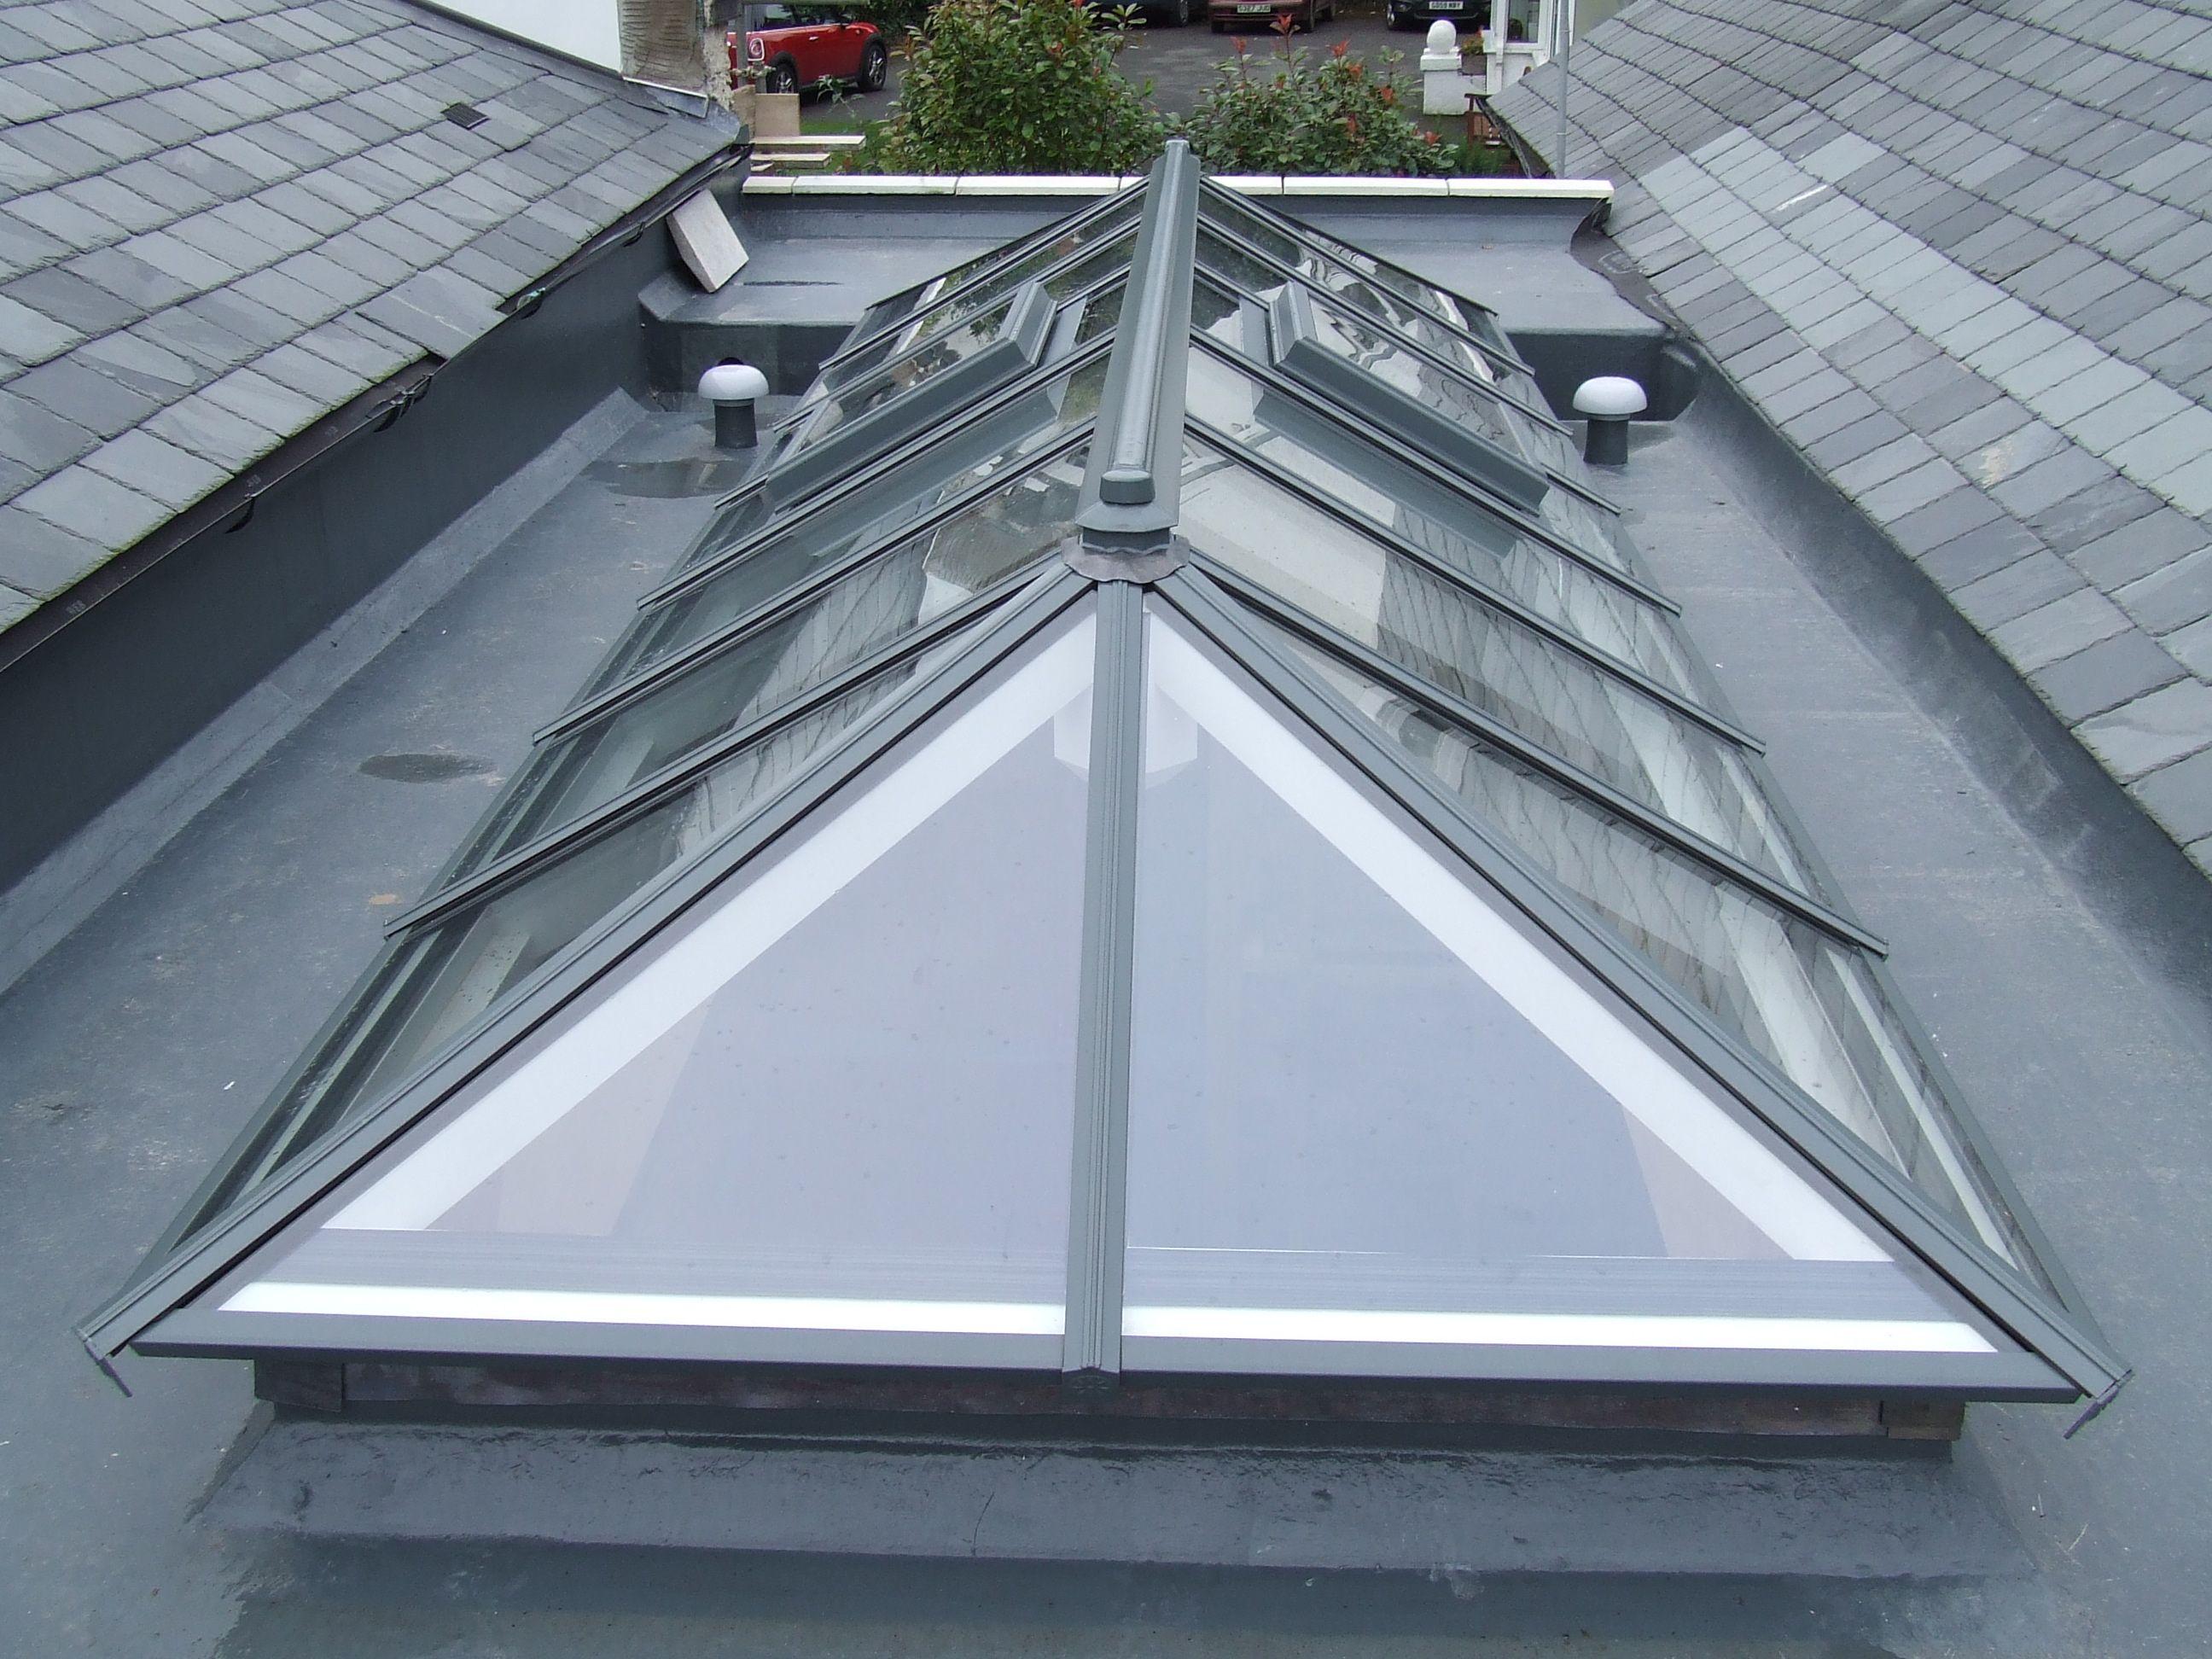 Double Glazed Roof Lanterns Roof Lantern Portico Design Skylight Design